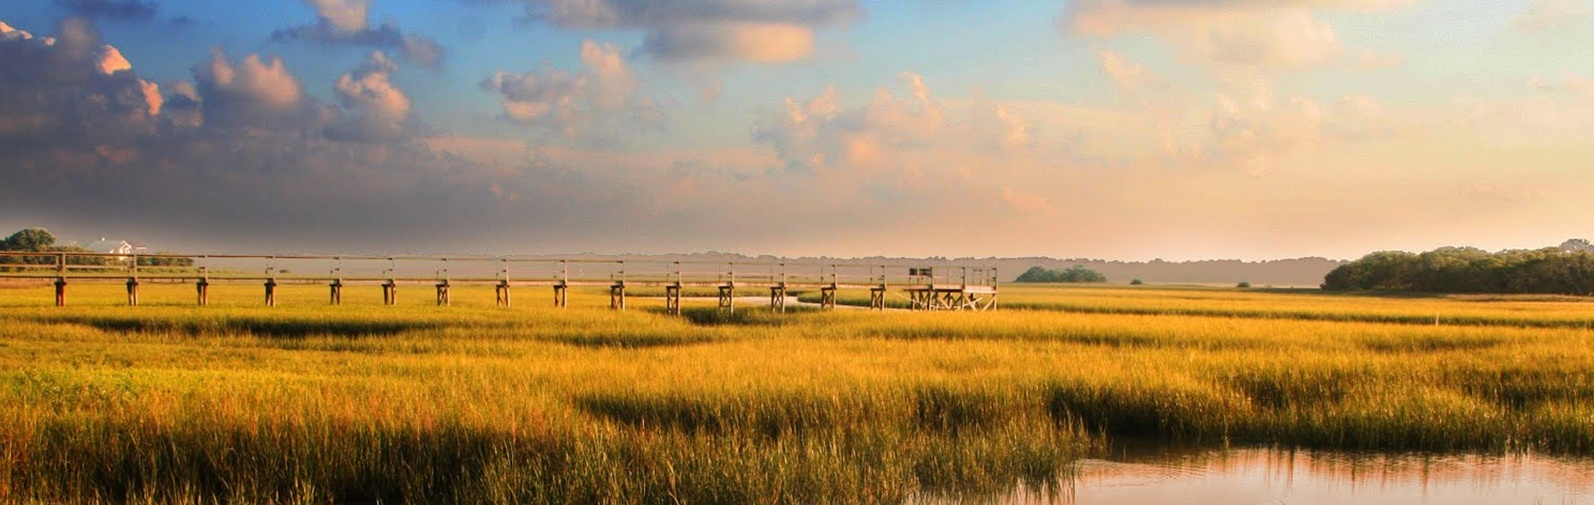 Marsh Views in Jacksonville, Florida